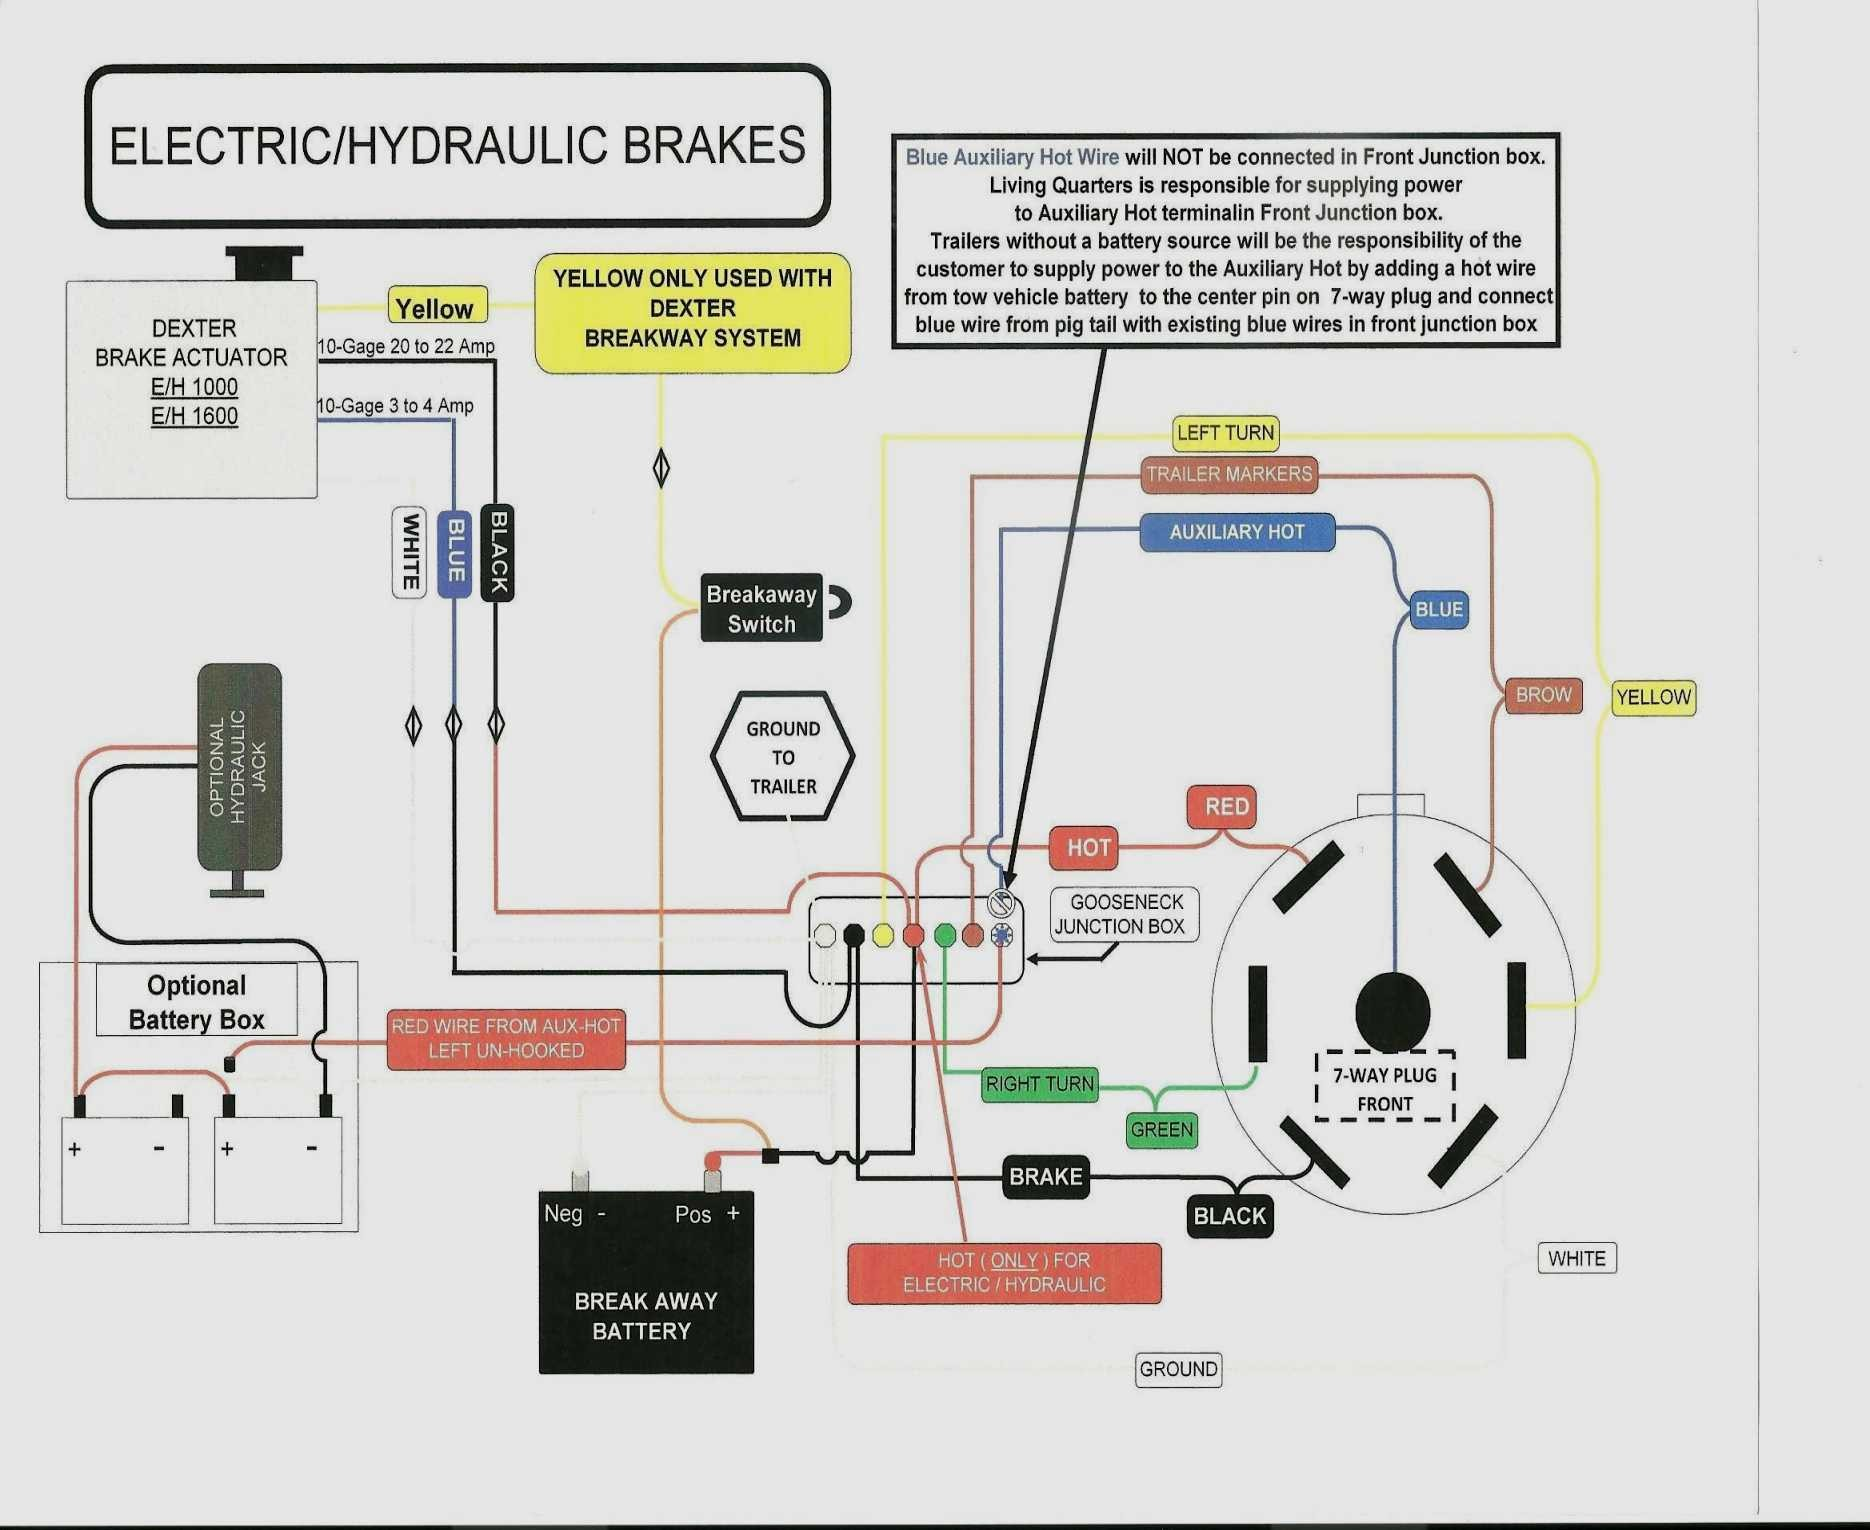 7 Way Trailer Plug Wiring Diagram Hopkins 7 Way Plug Wiring Diagram Wiring Diagrams Of 7 Way Trailer Plug Wiring Diagram